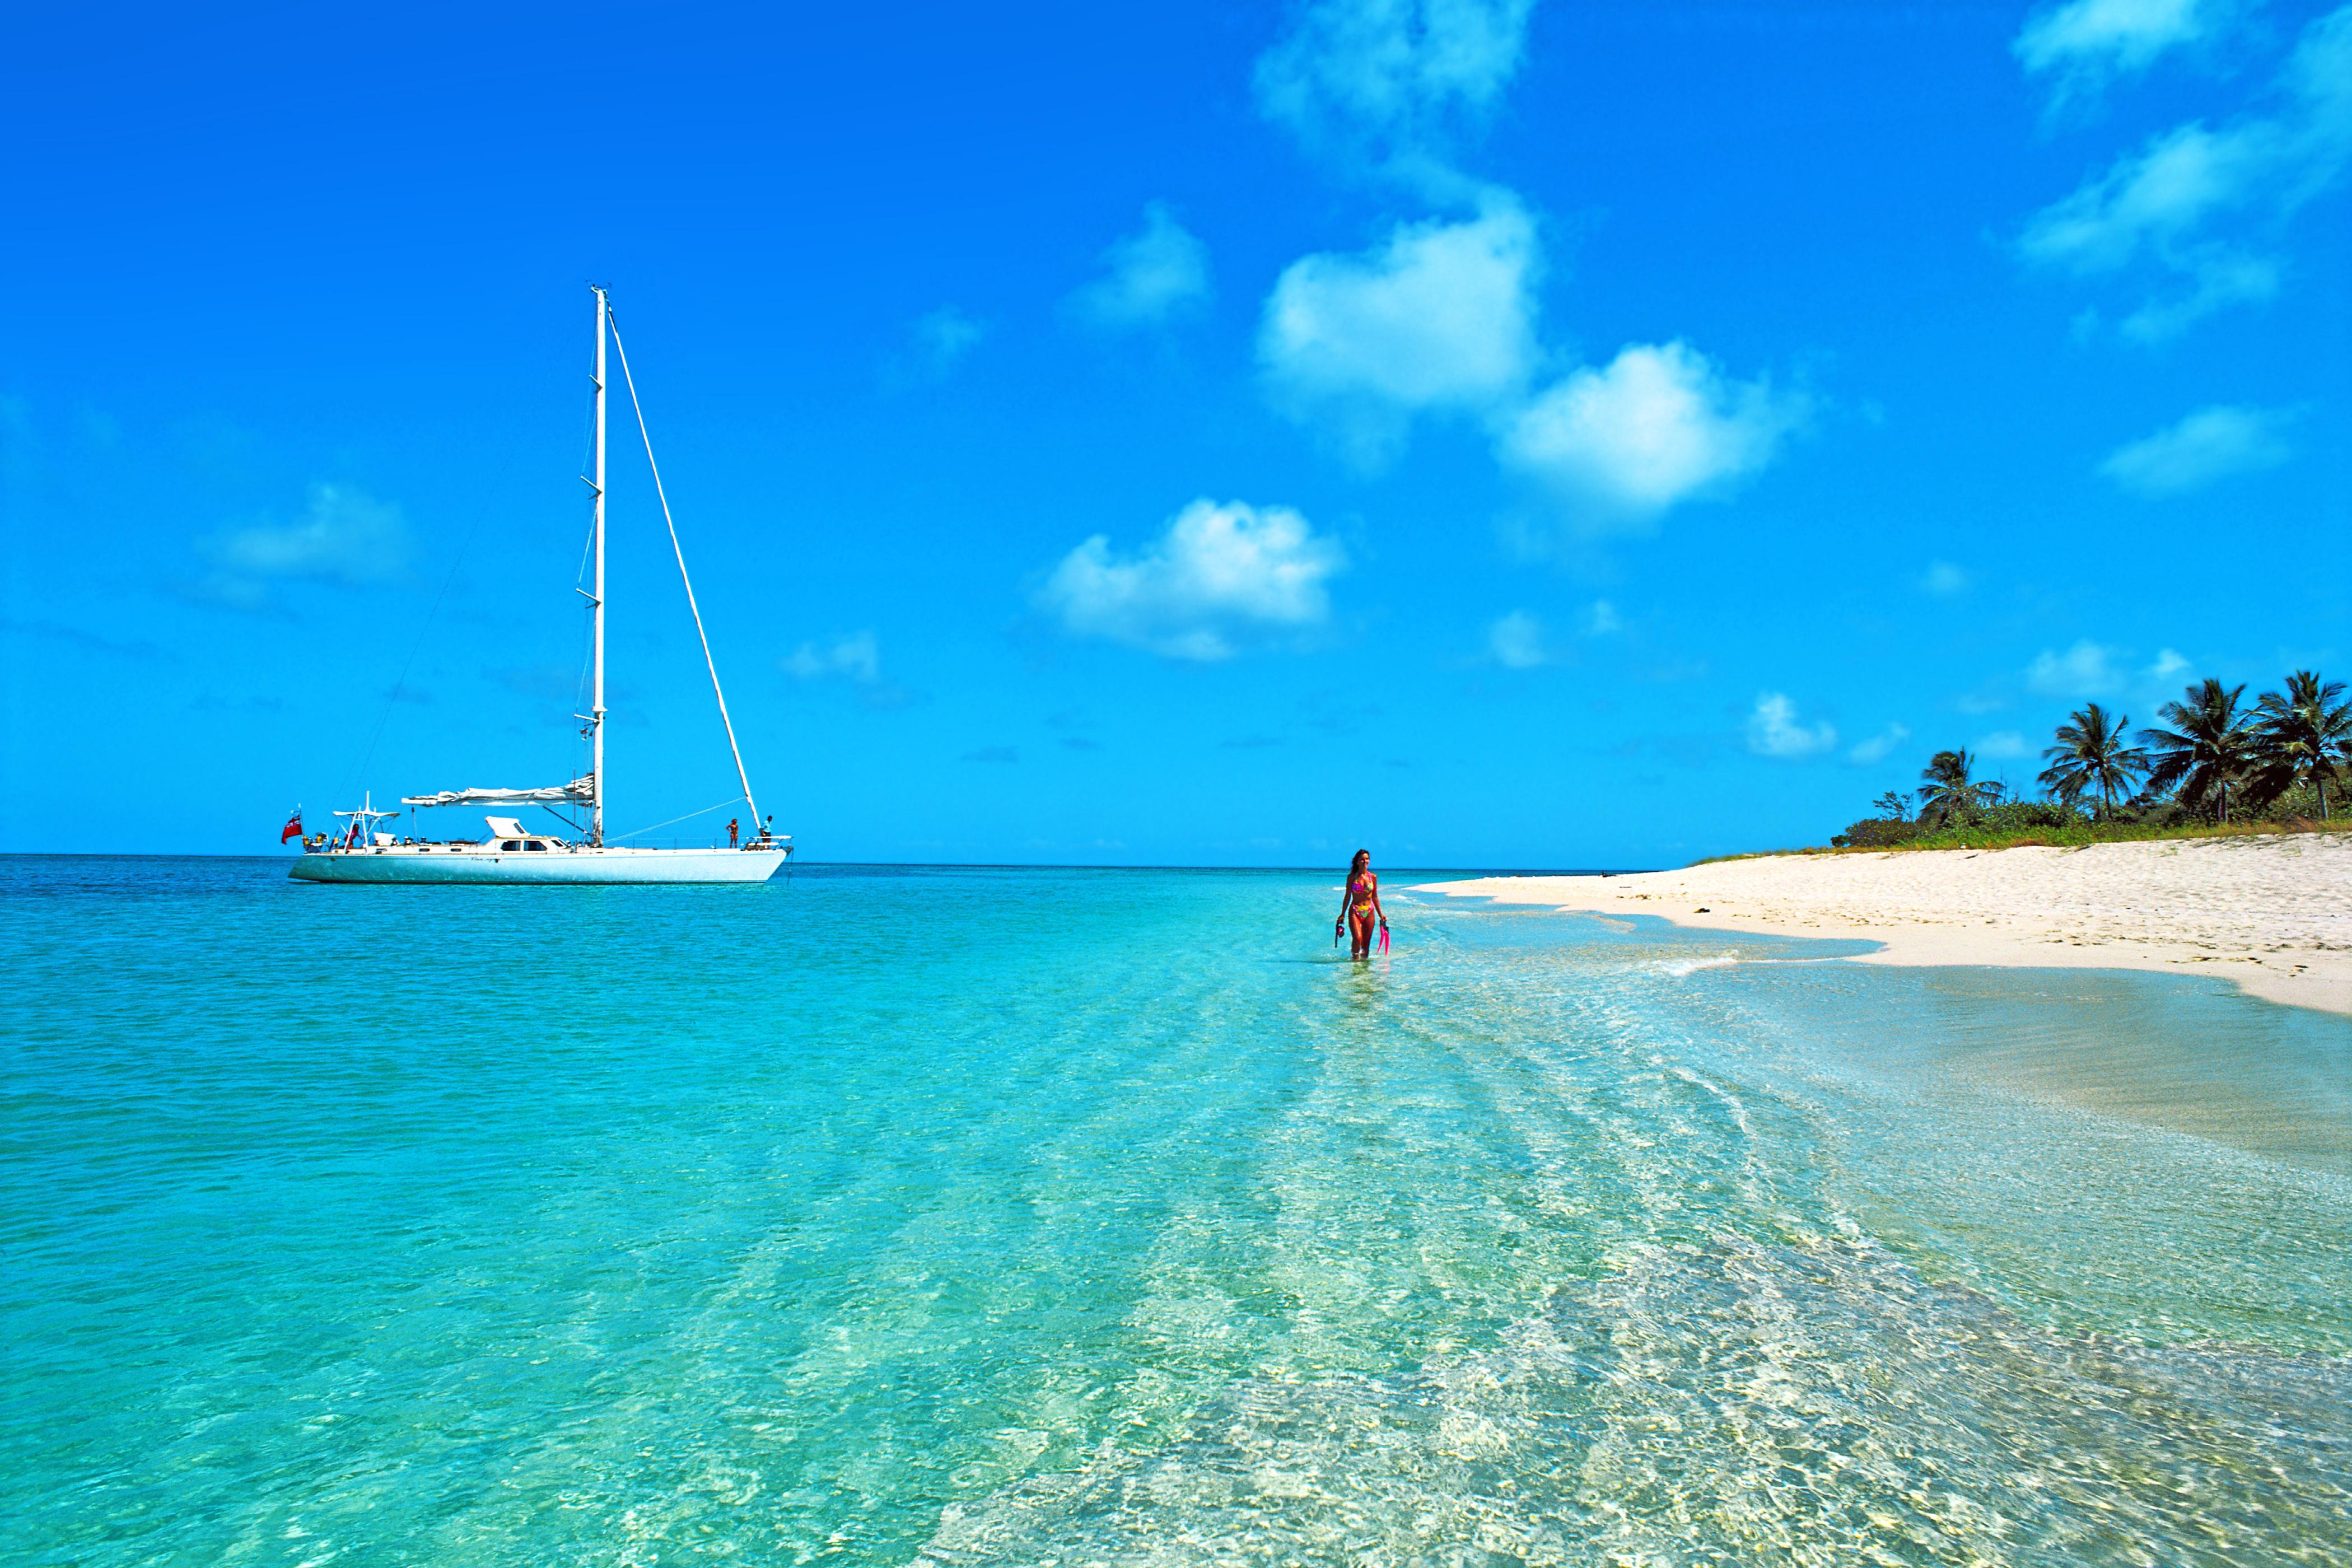 позволяет фото яхта море пляж ним